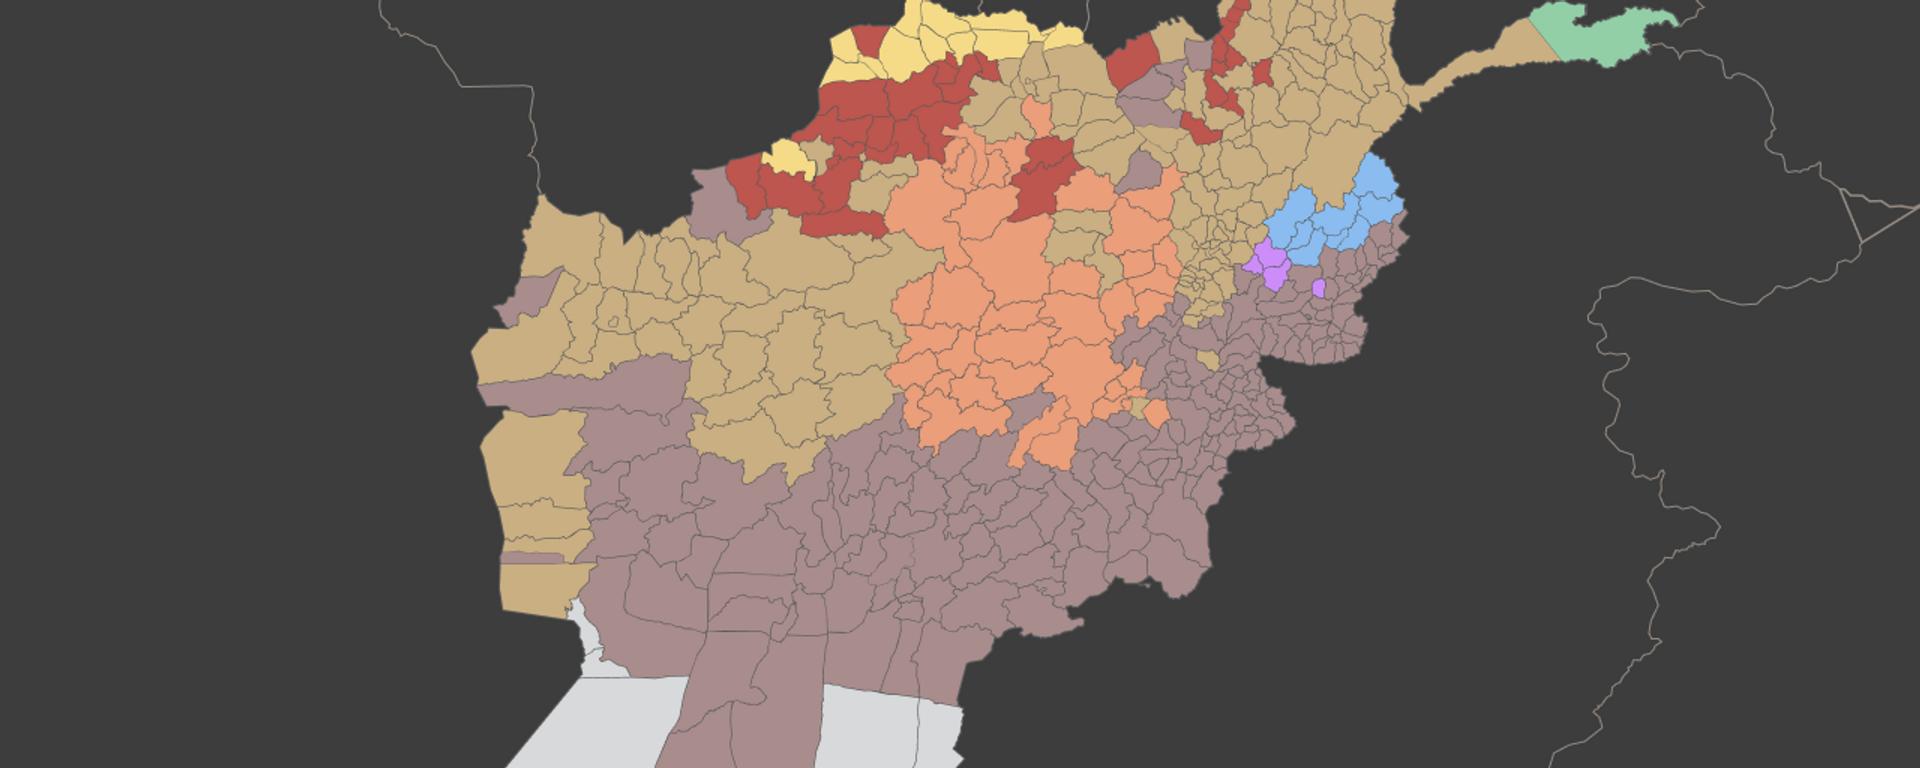 Las etnias que conforman Afganistán - Sputnik Mundo, 1920, 23.08.2021